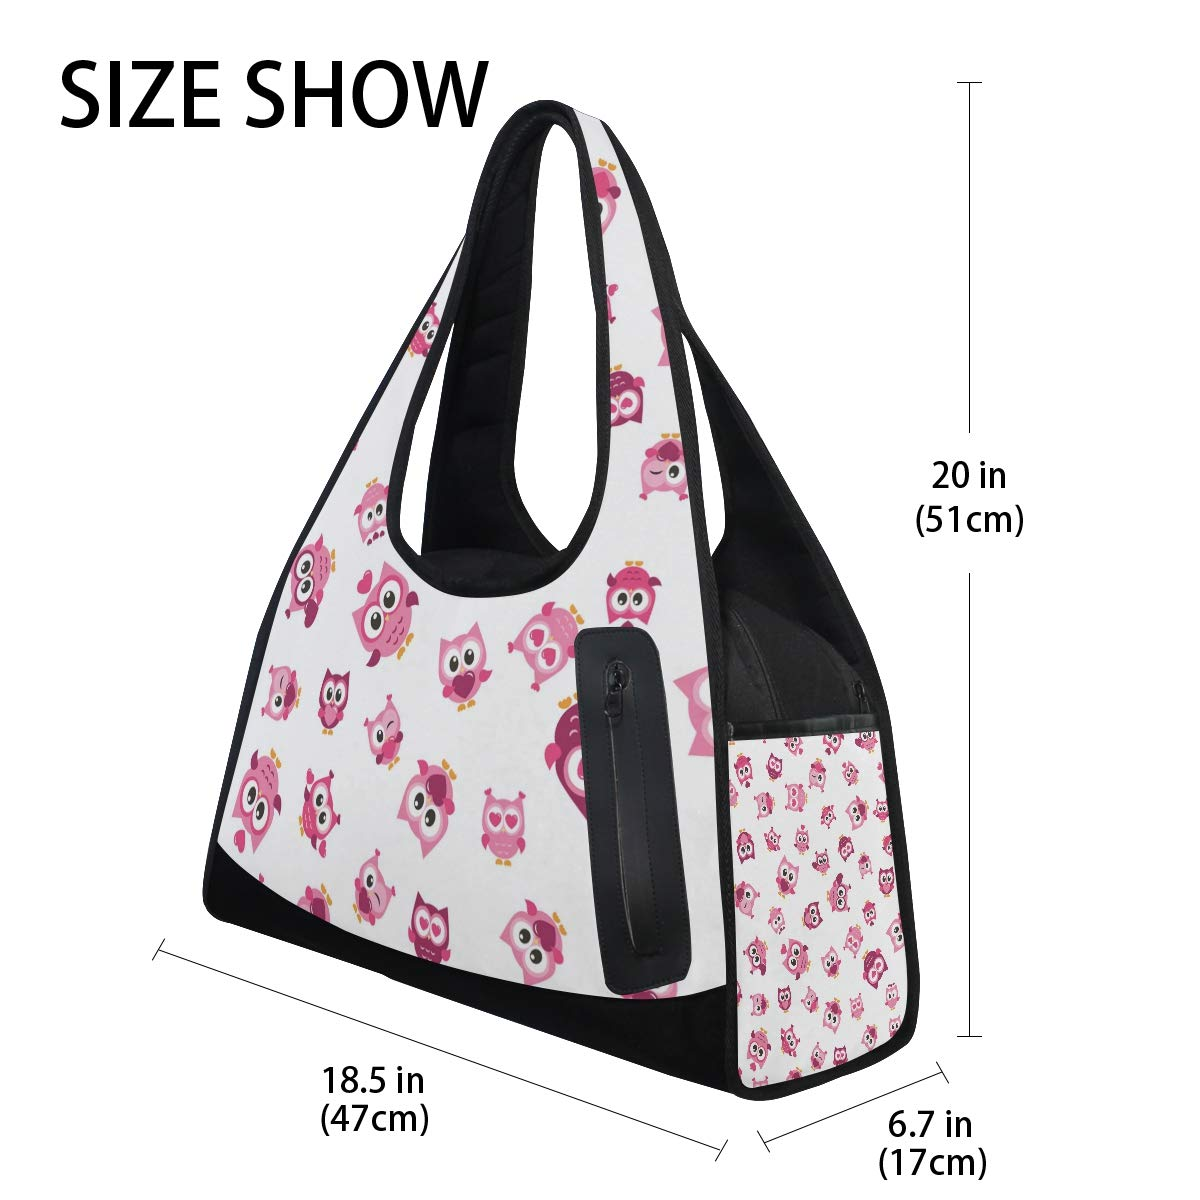 Unisex Travel Duffels Gym Bag Cute Owl Canvas Weekender Bag Shoulder Bag Totes bags